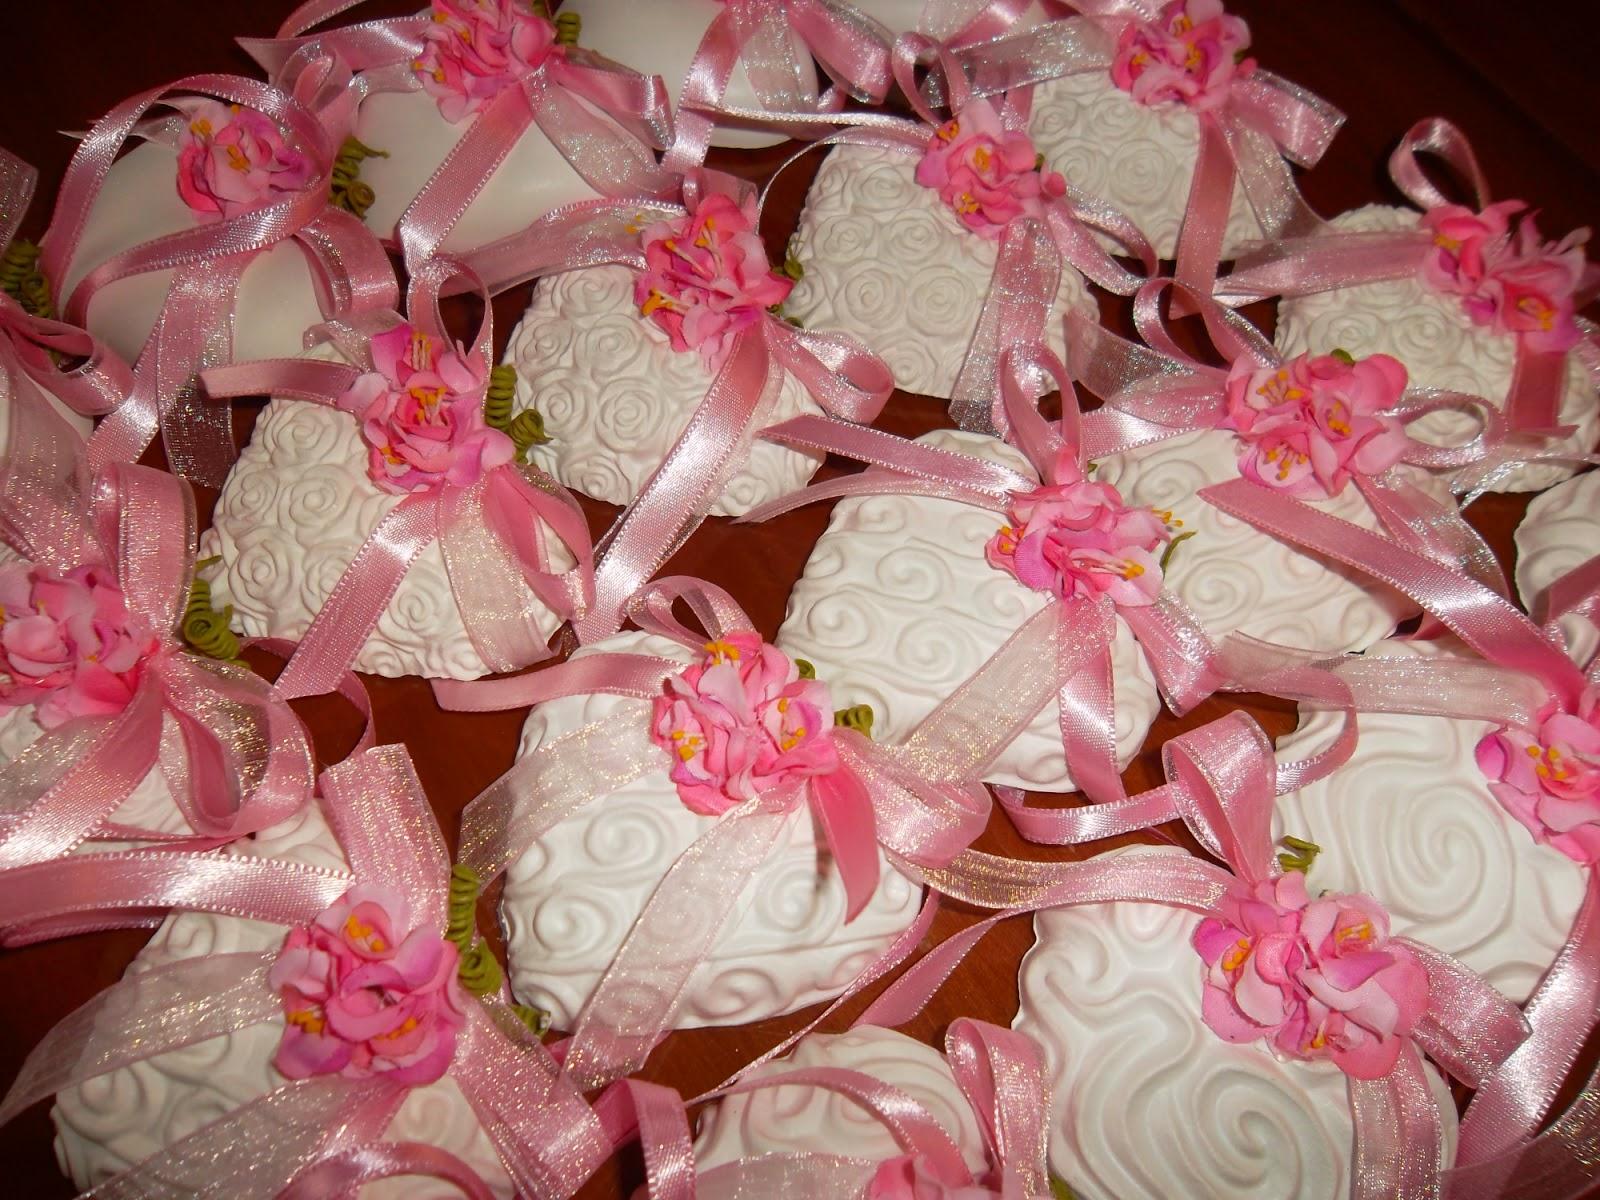 Marianna creazioni e ricami cuori bianchi nastri e fiori for Fiori bianchi profumati